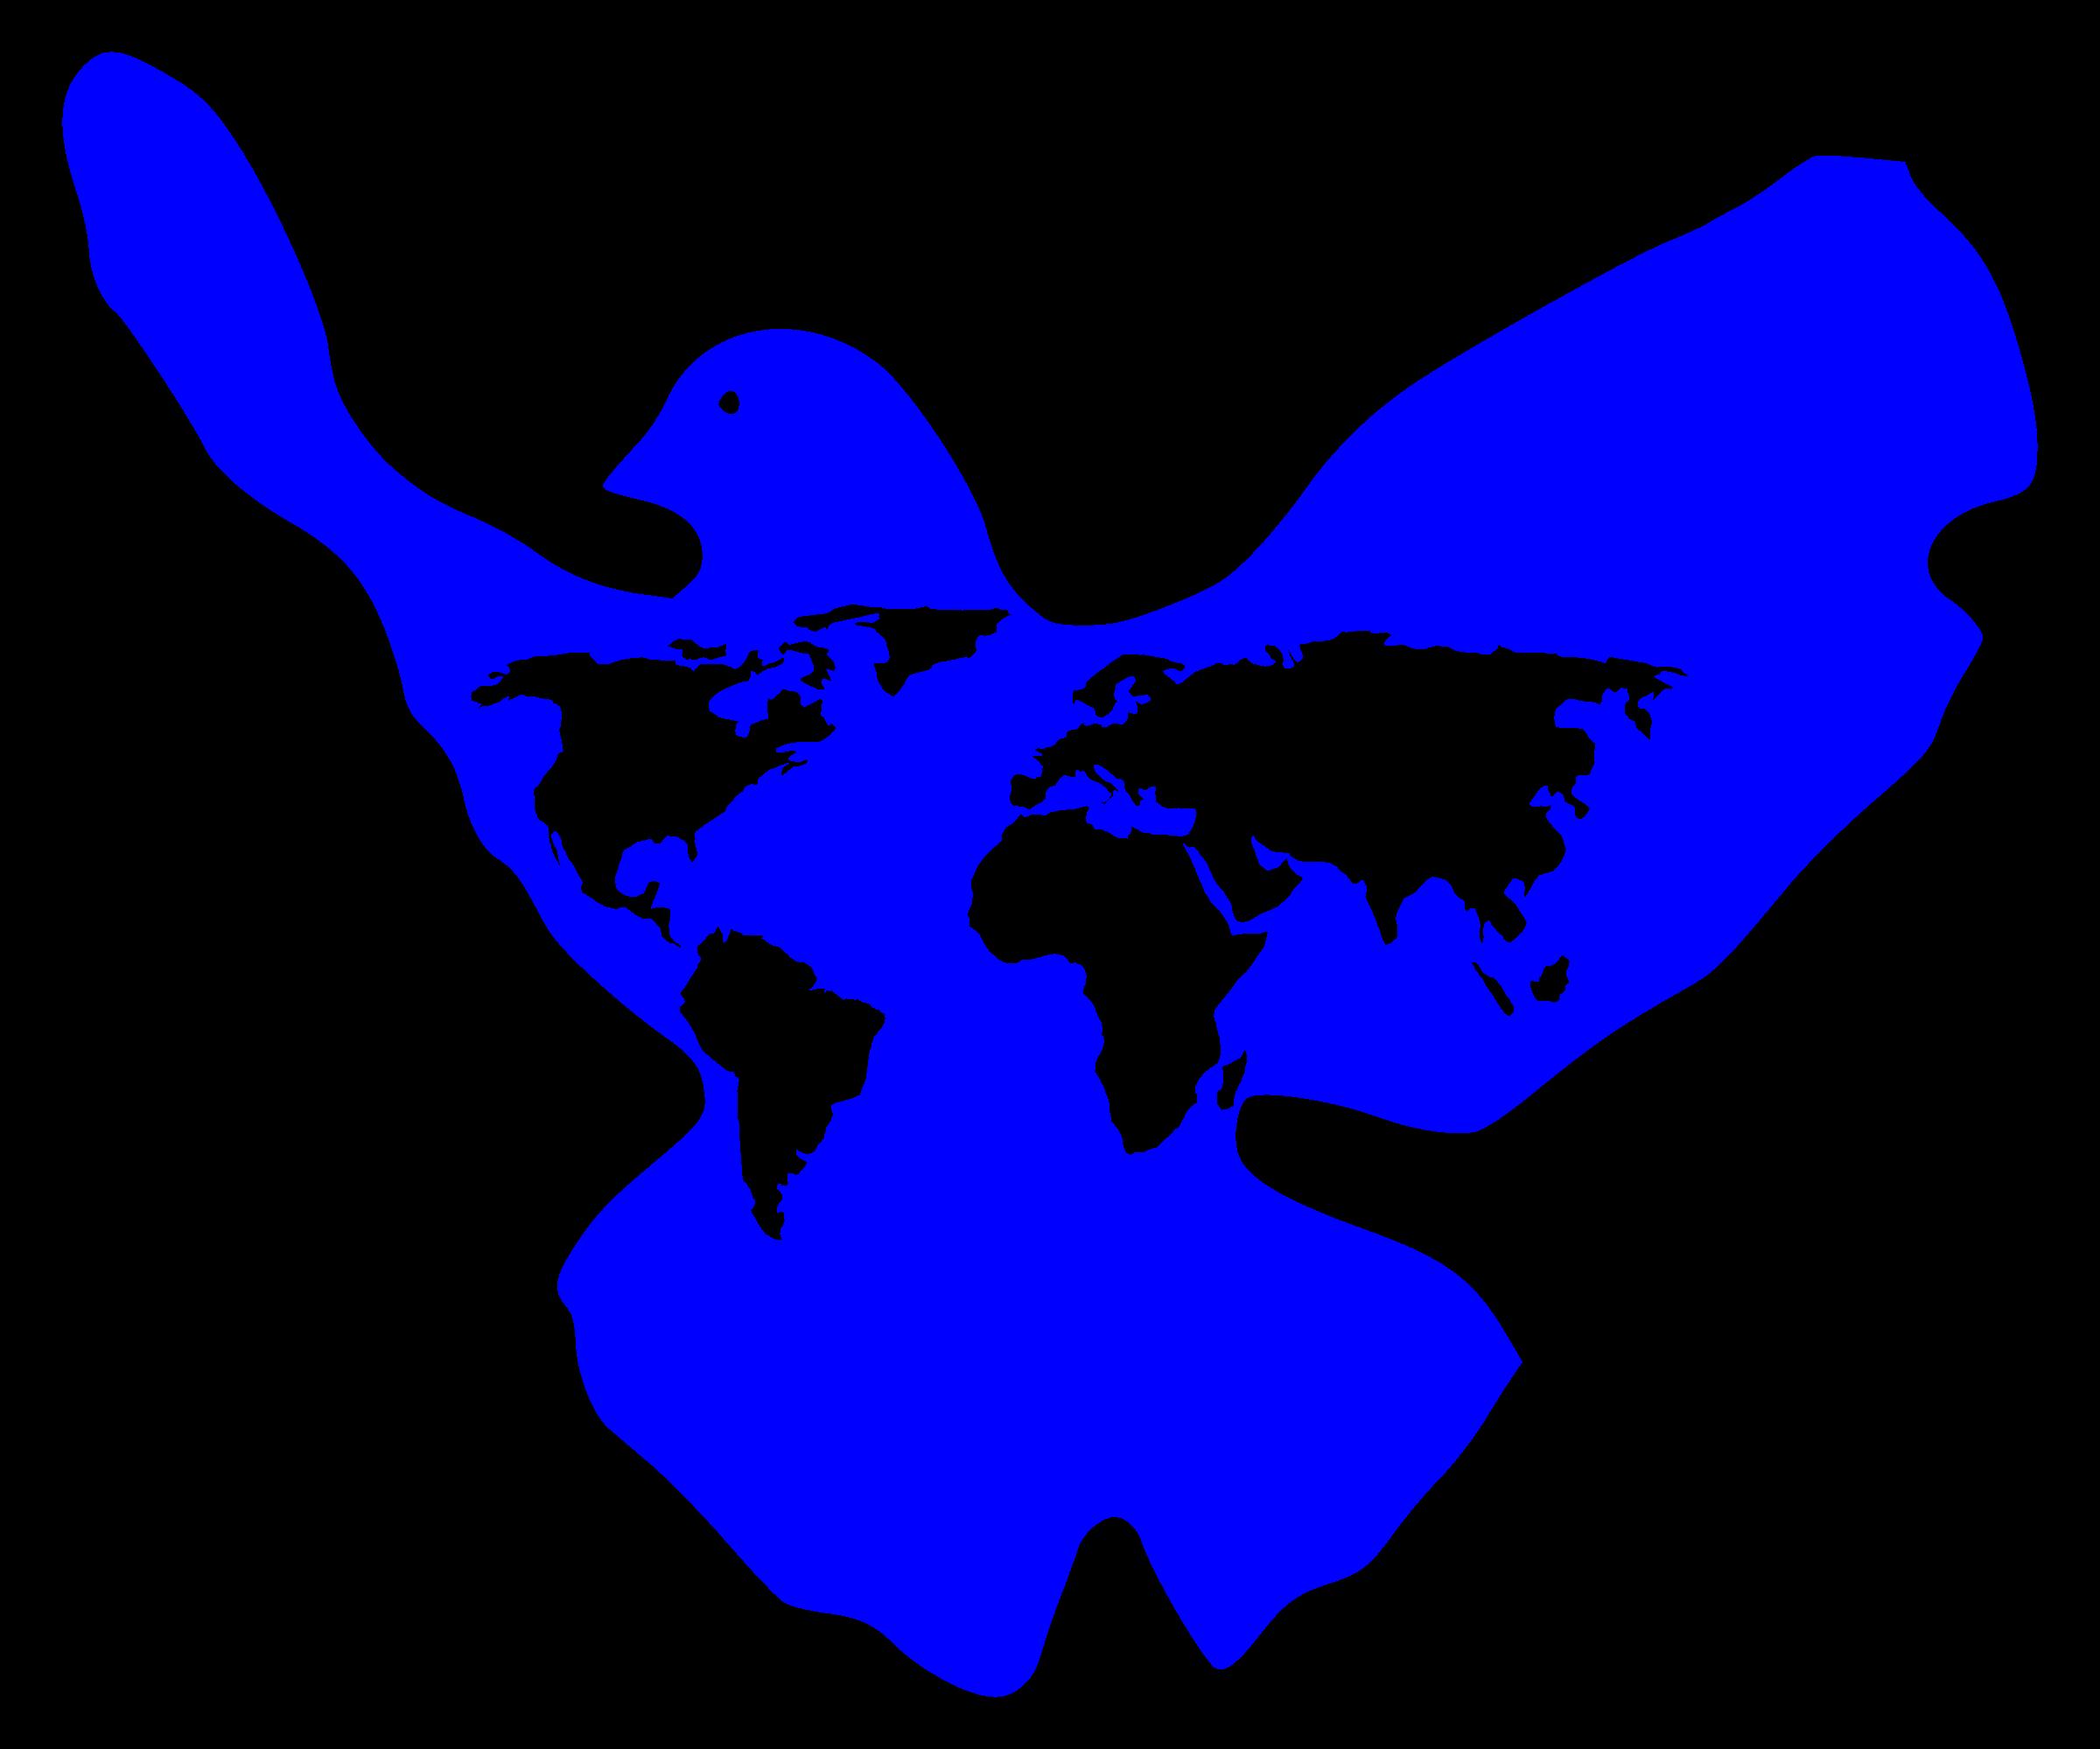 Clipart world peaceful world. Presentation name peace